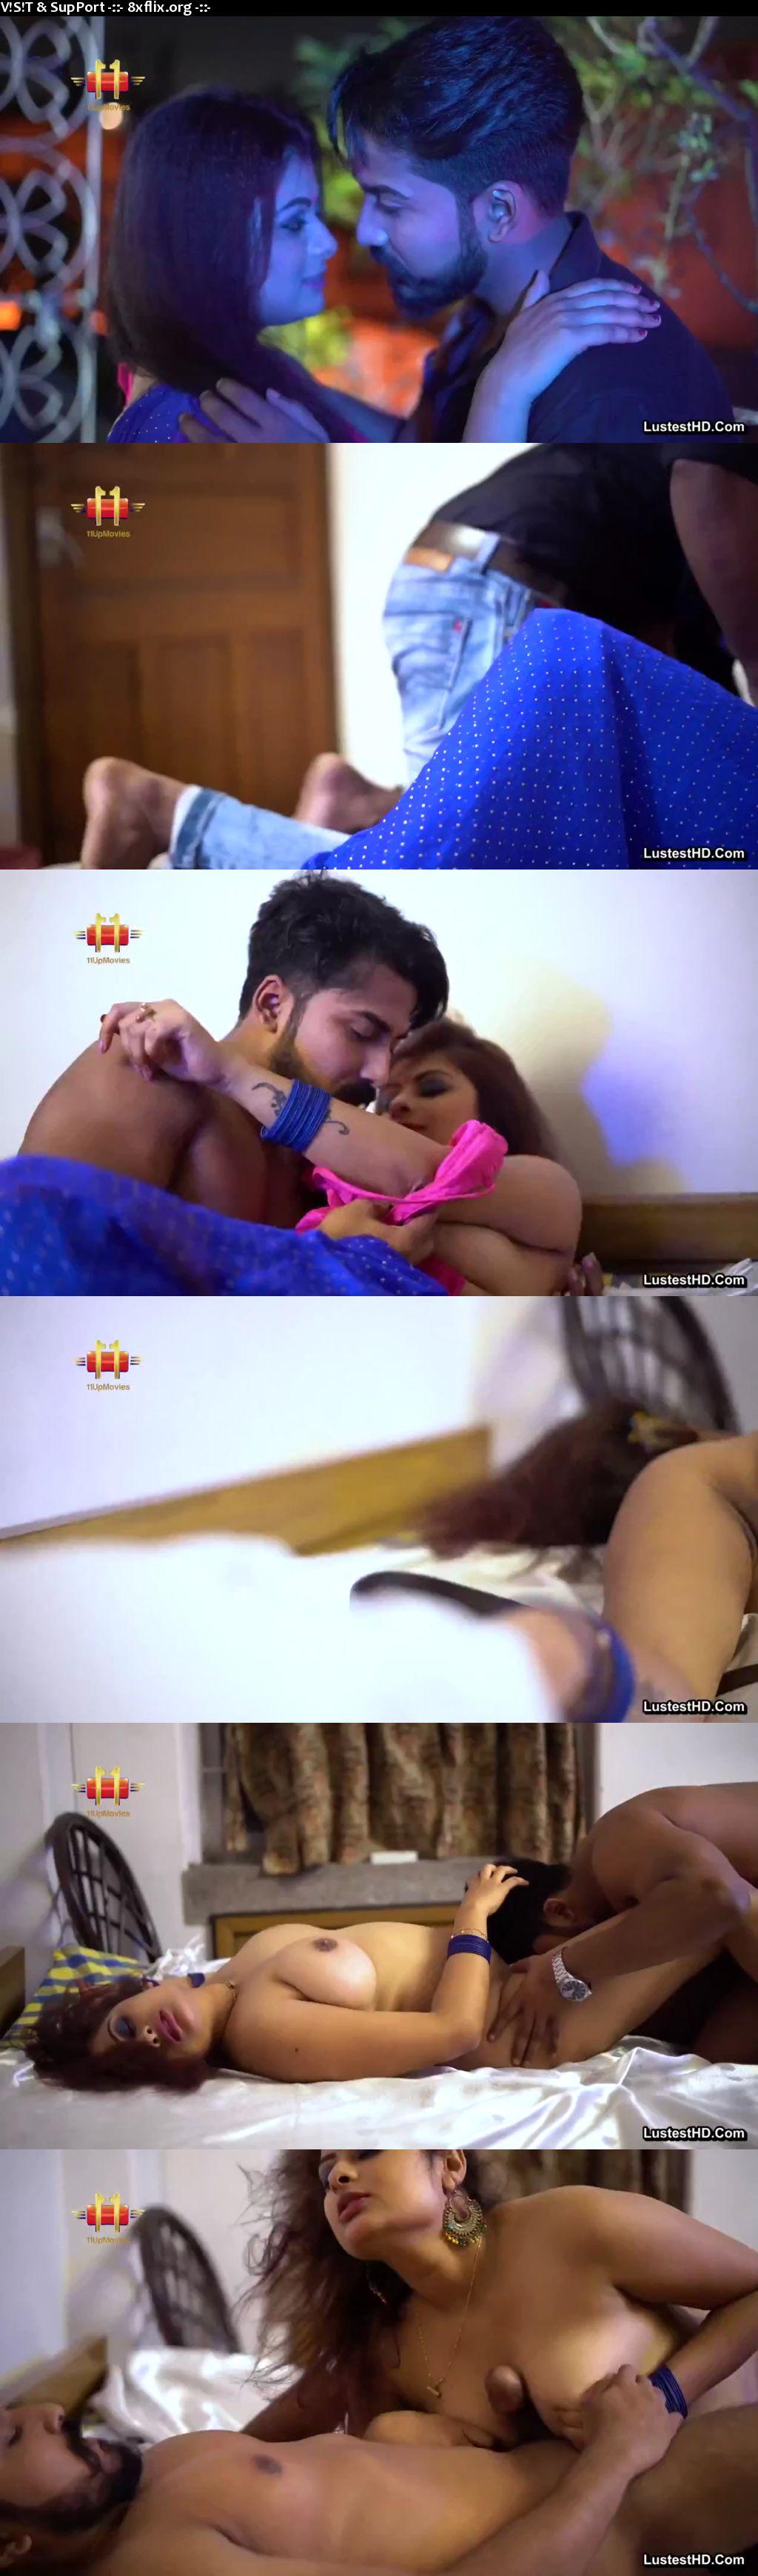 18+ Gali Mein Aaj Chand Nikla 2020 Full Hindi HOT Movie Download 720p HDRip